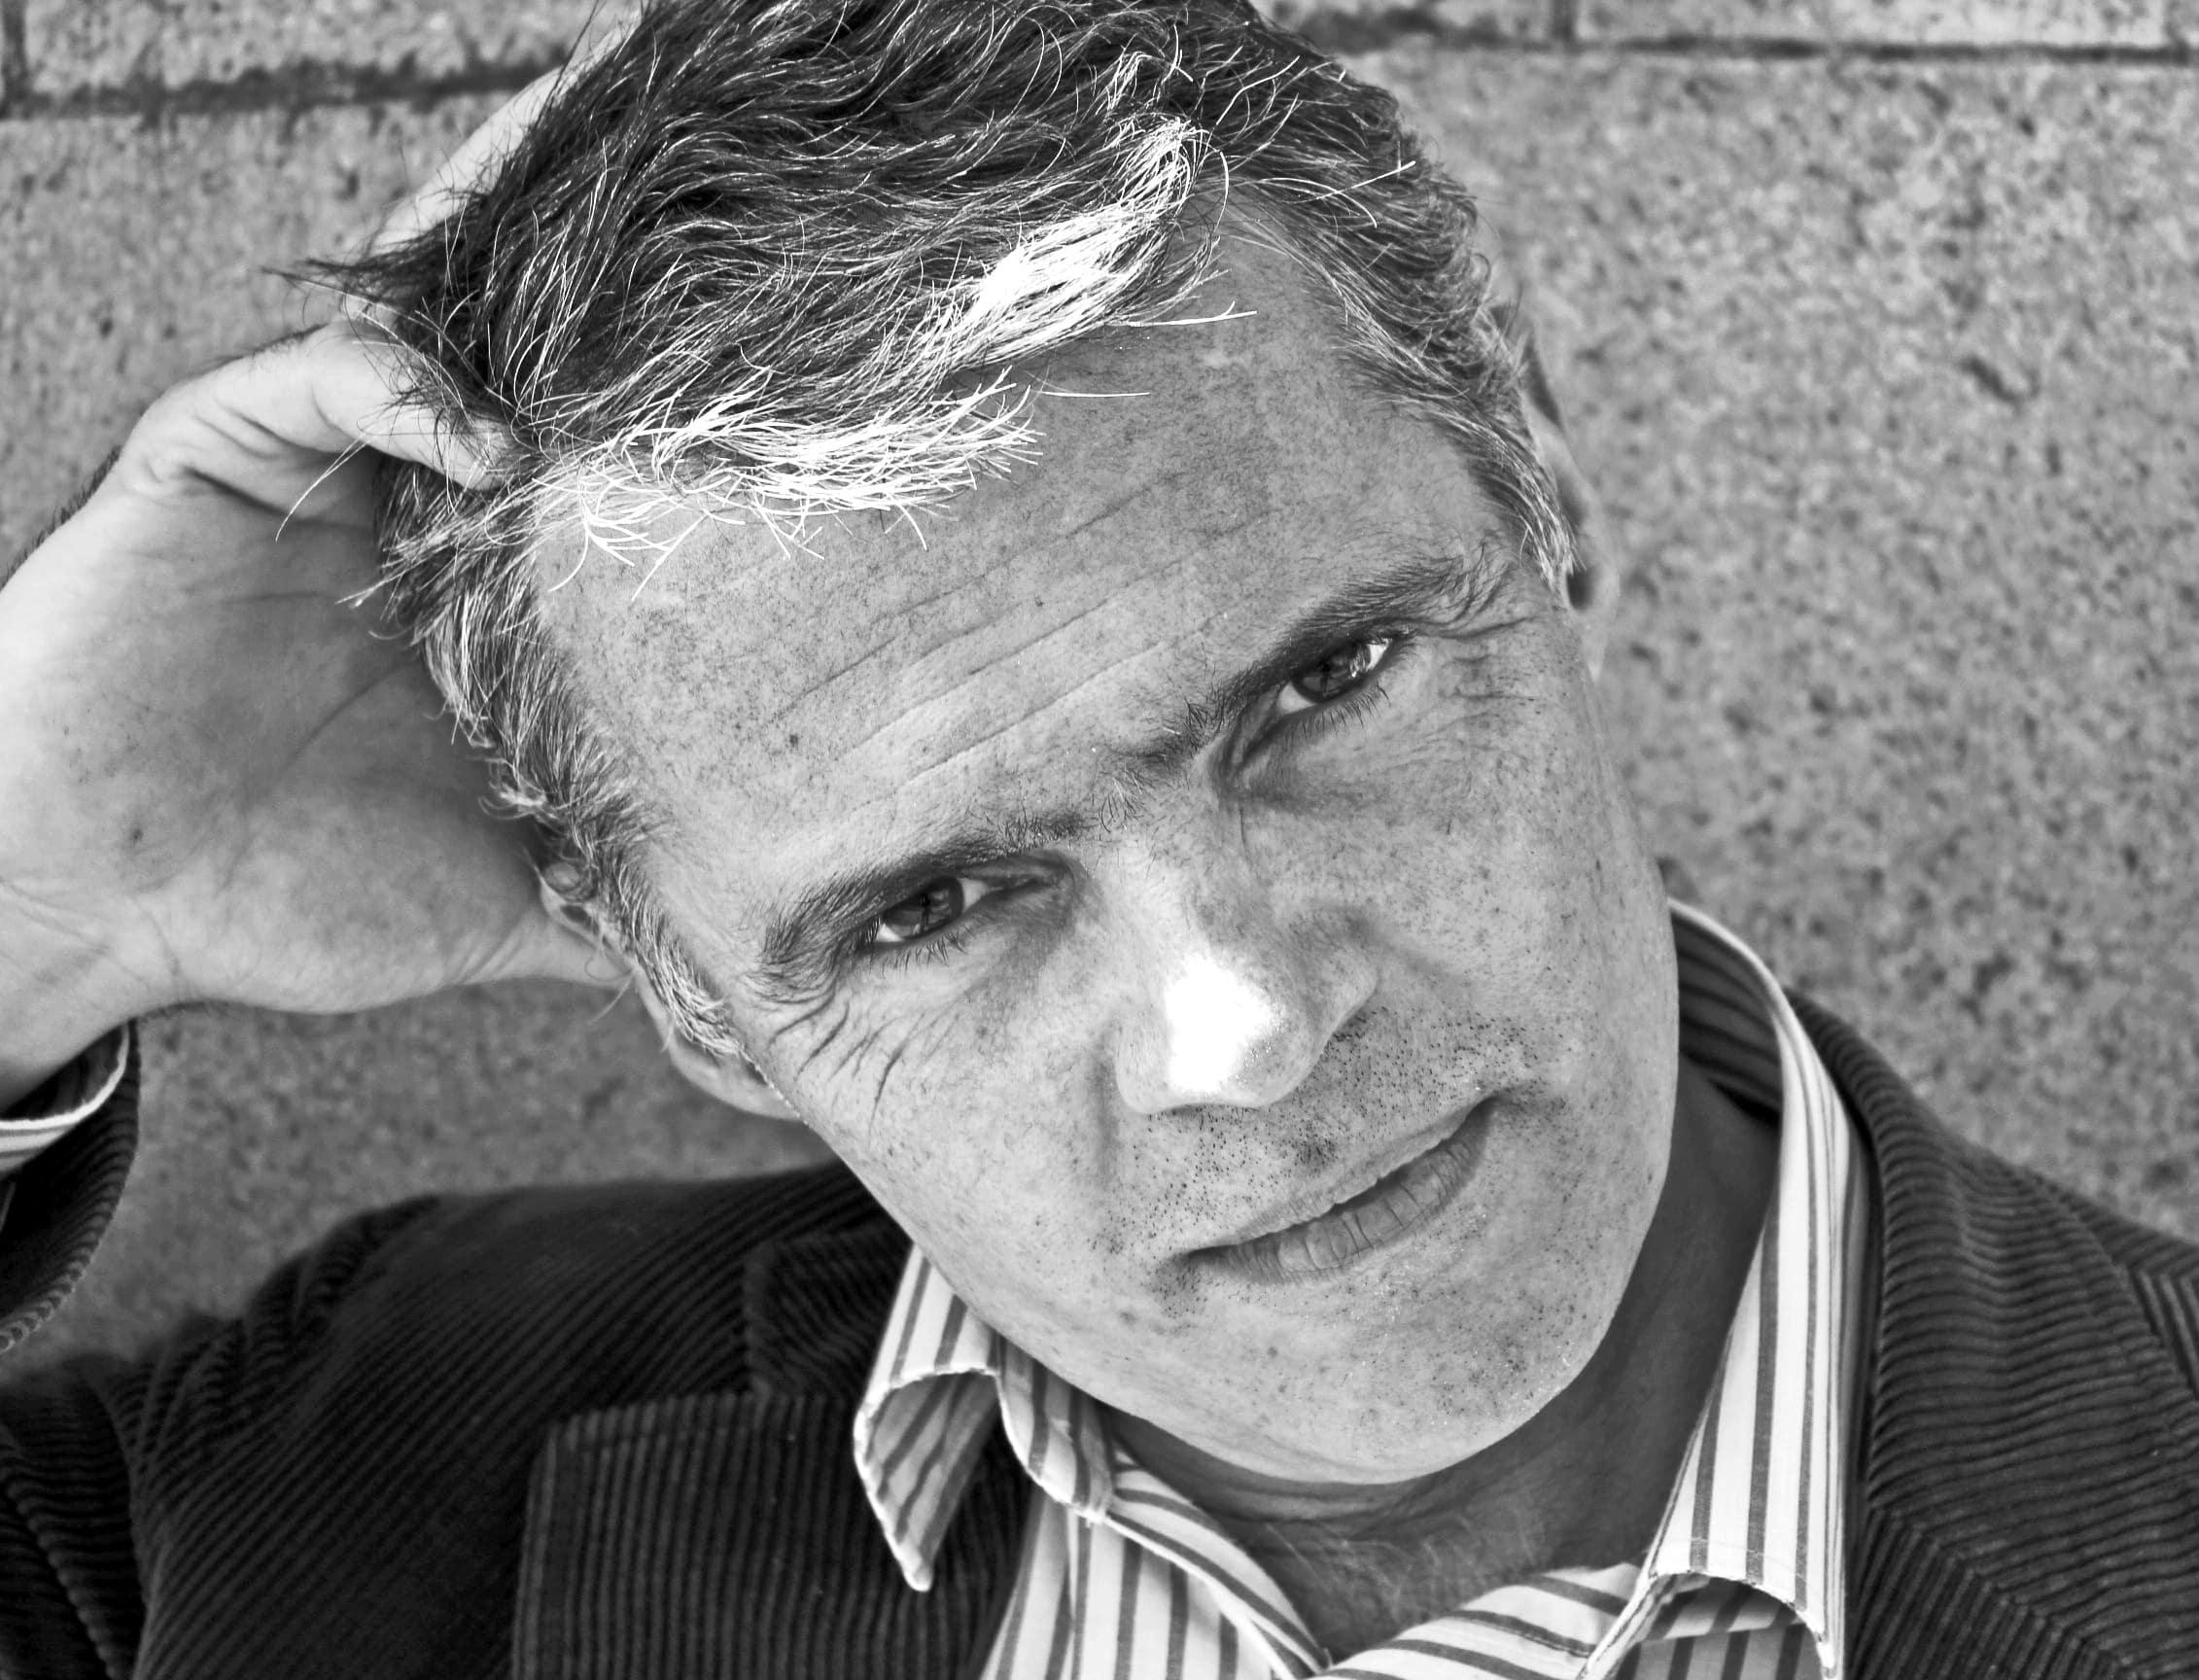 Peter Jukes es un bloguero que alcanzó popularidad por cubrir en Twitter el caso del News of the World.